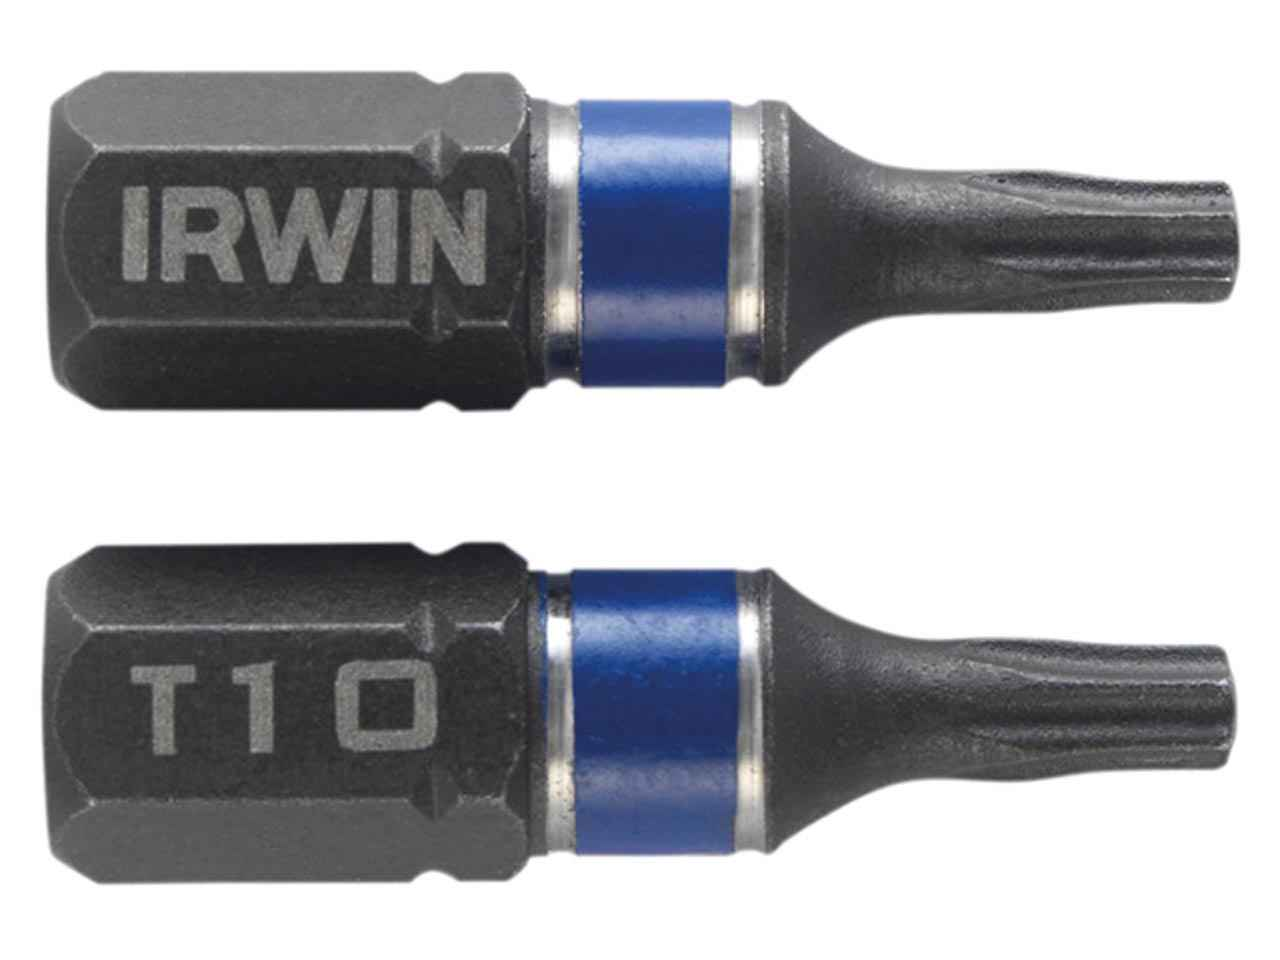 Pack of 2 IRWIN 1923332 Impact Screwdriver Bits 50 mm T20